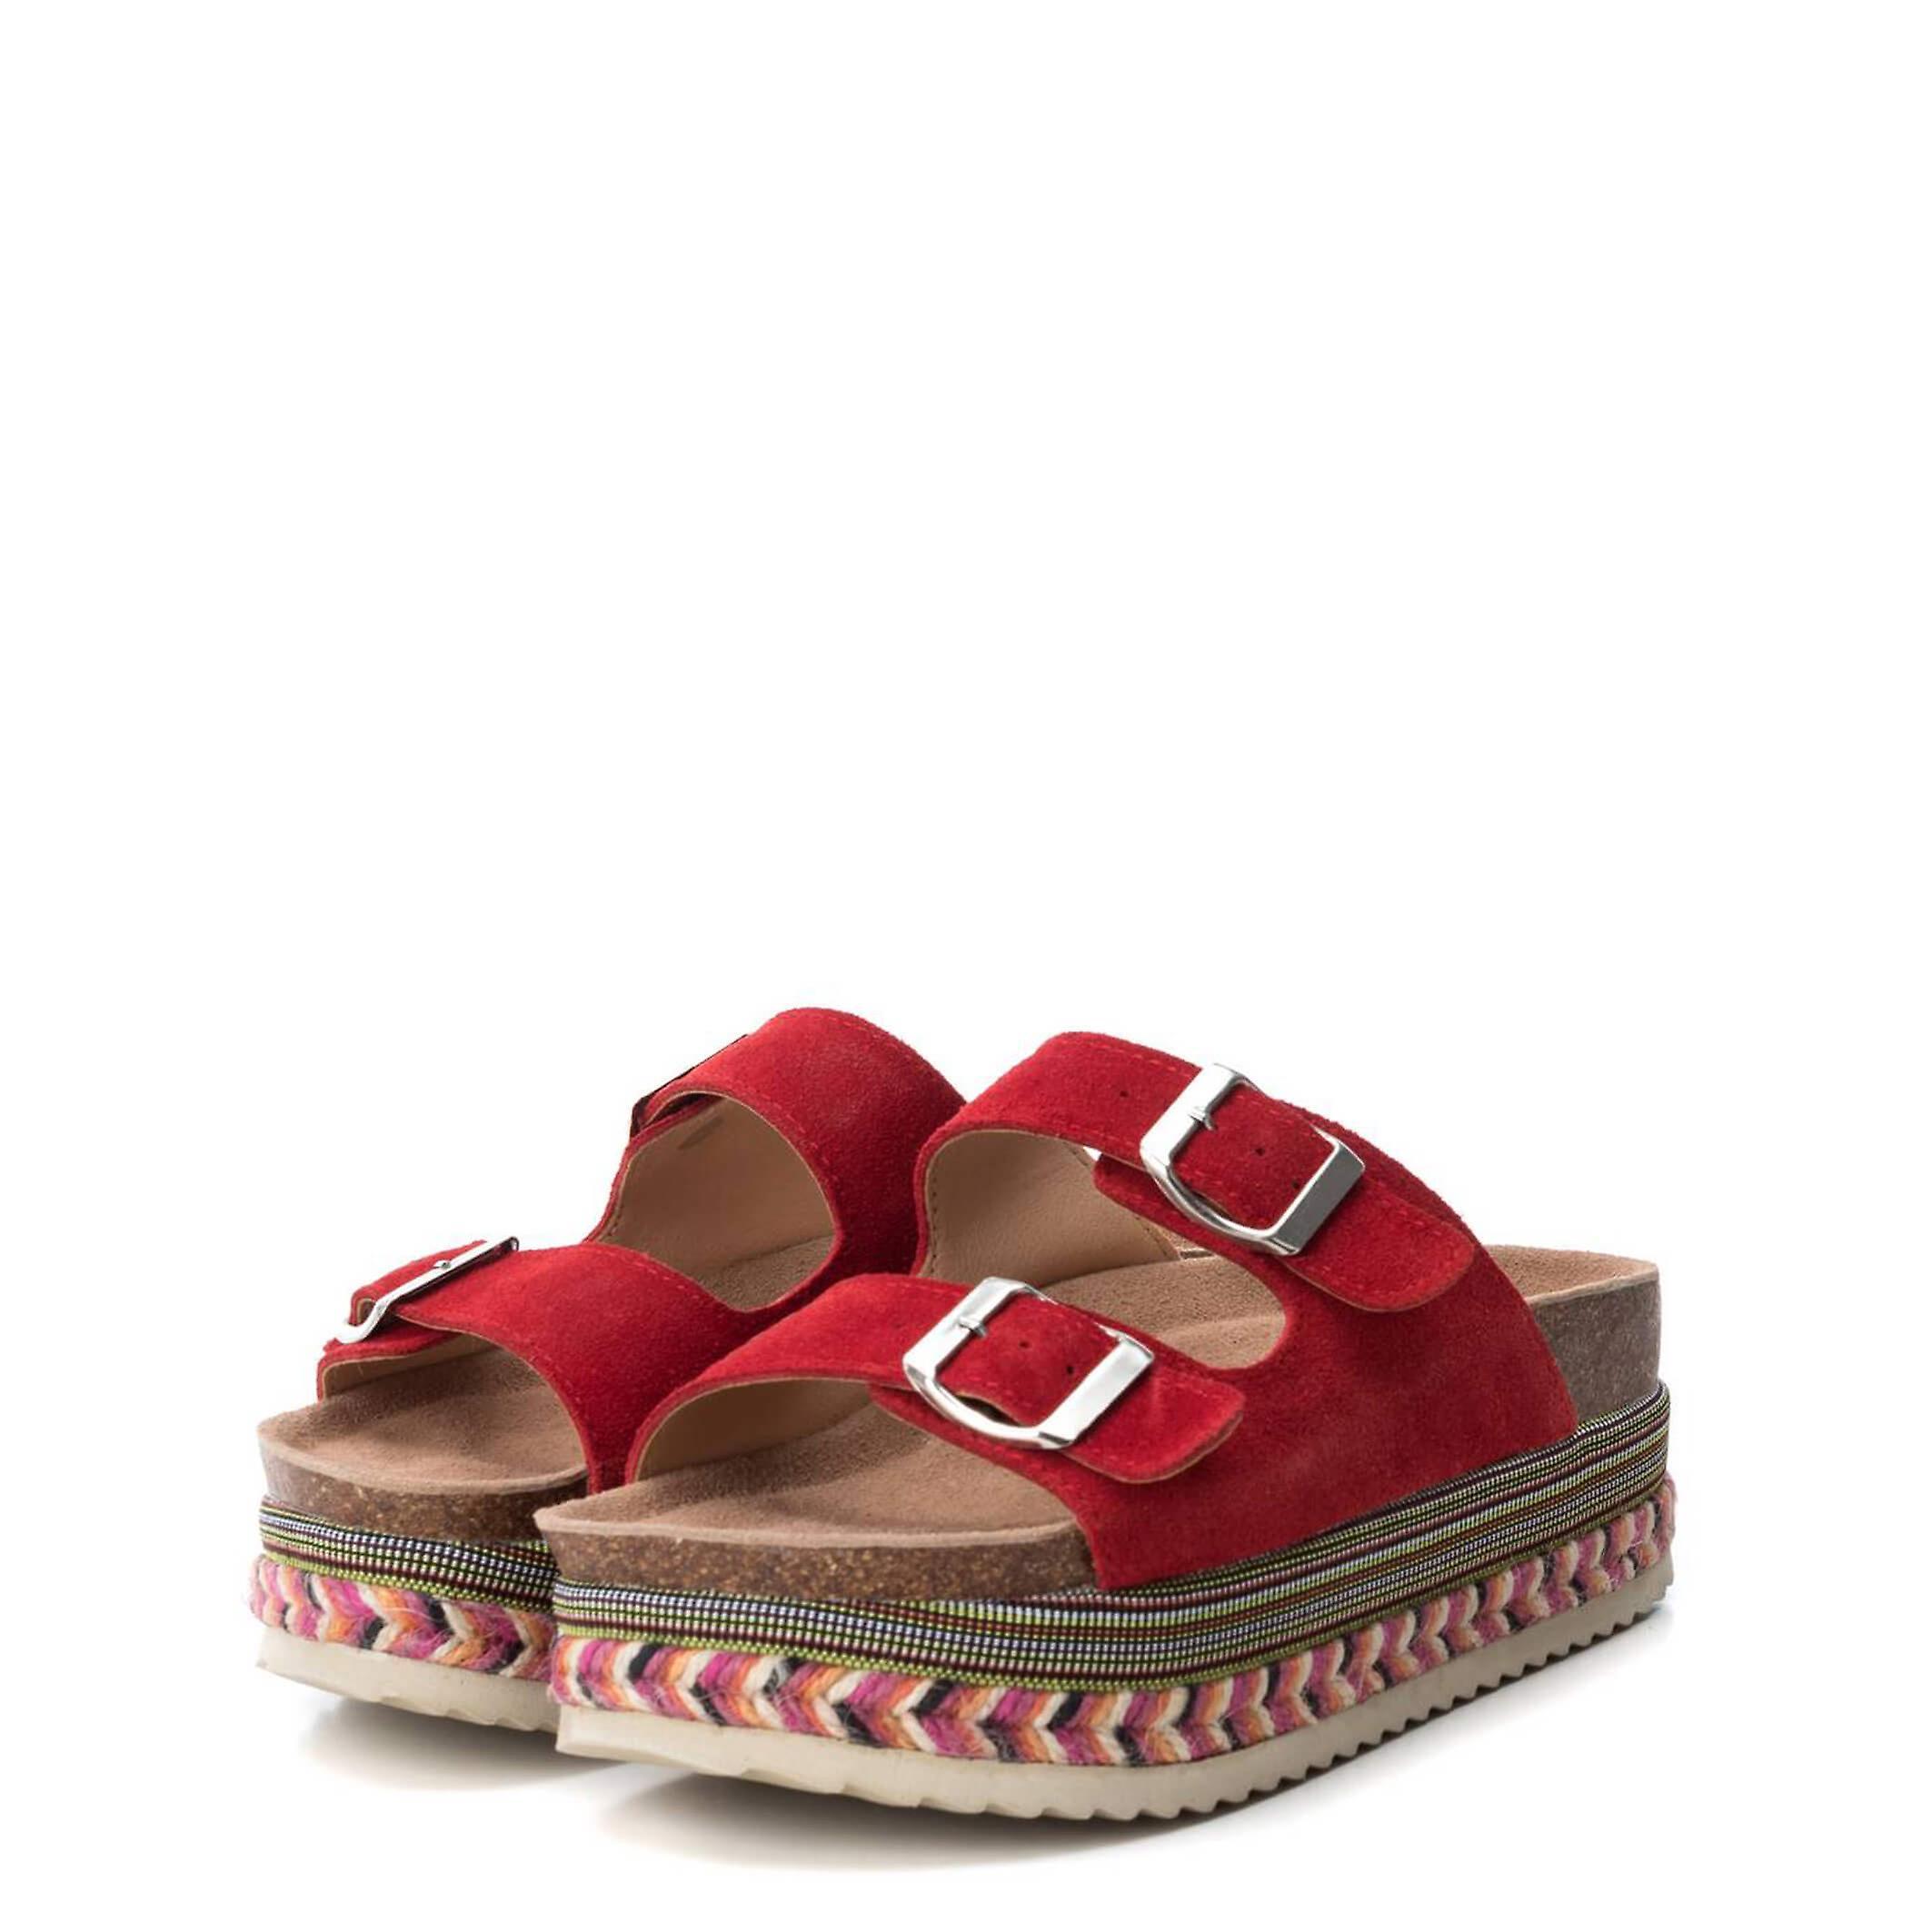 Xti Original Women Spring/Summer Flip Flops - Red Color 40491